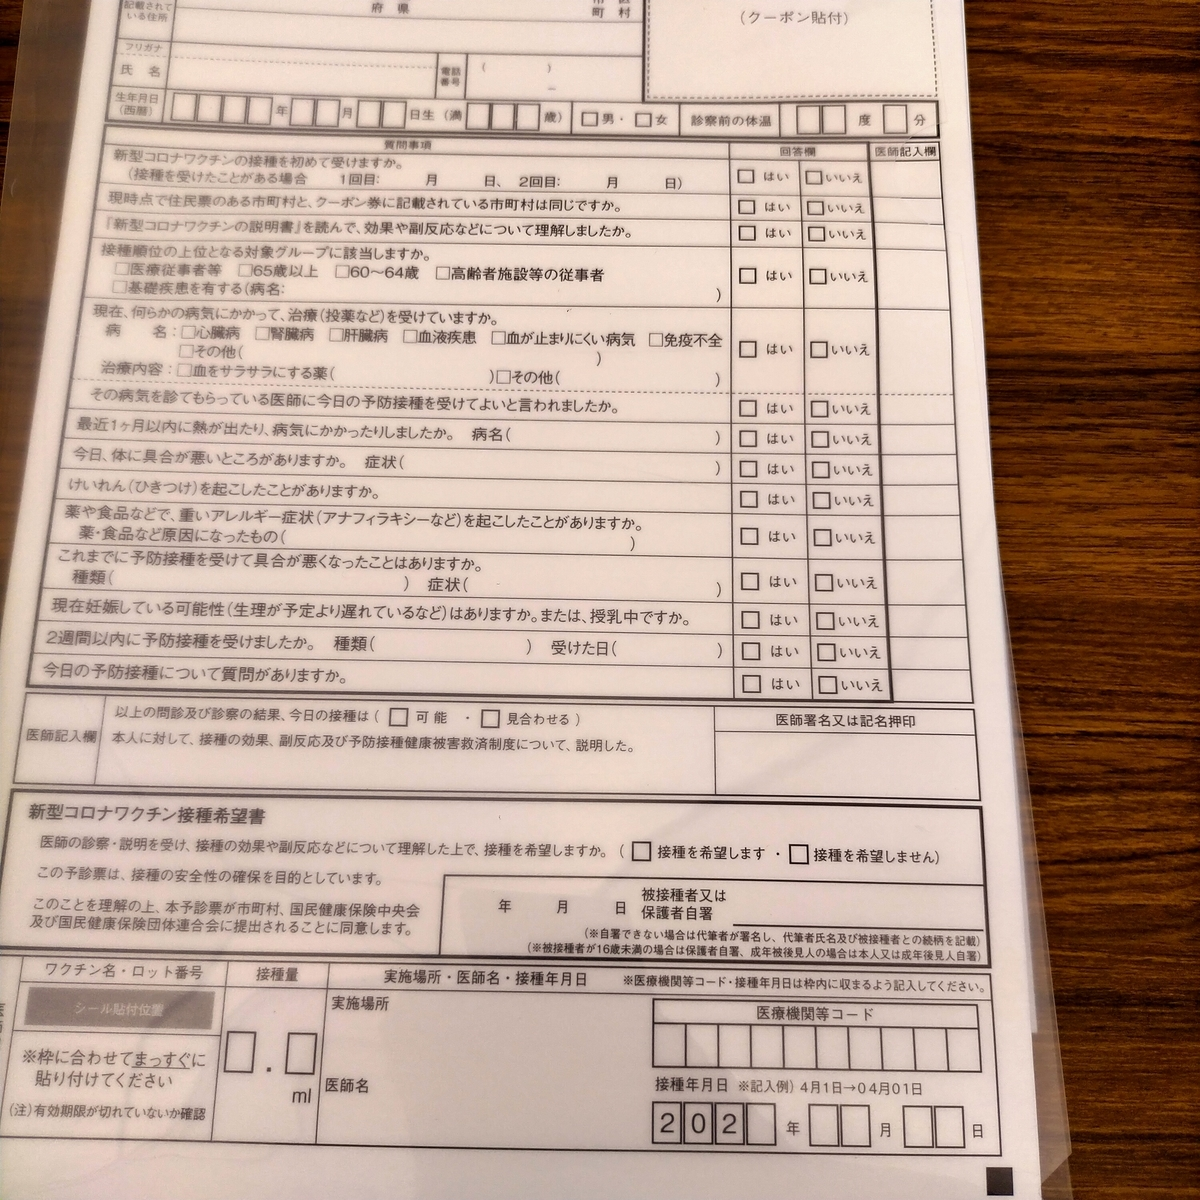 f:id:tsumagari2010:20210610064908j:plain